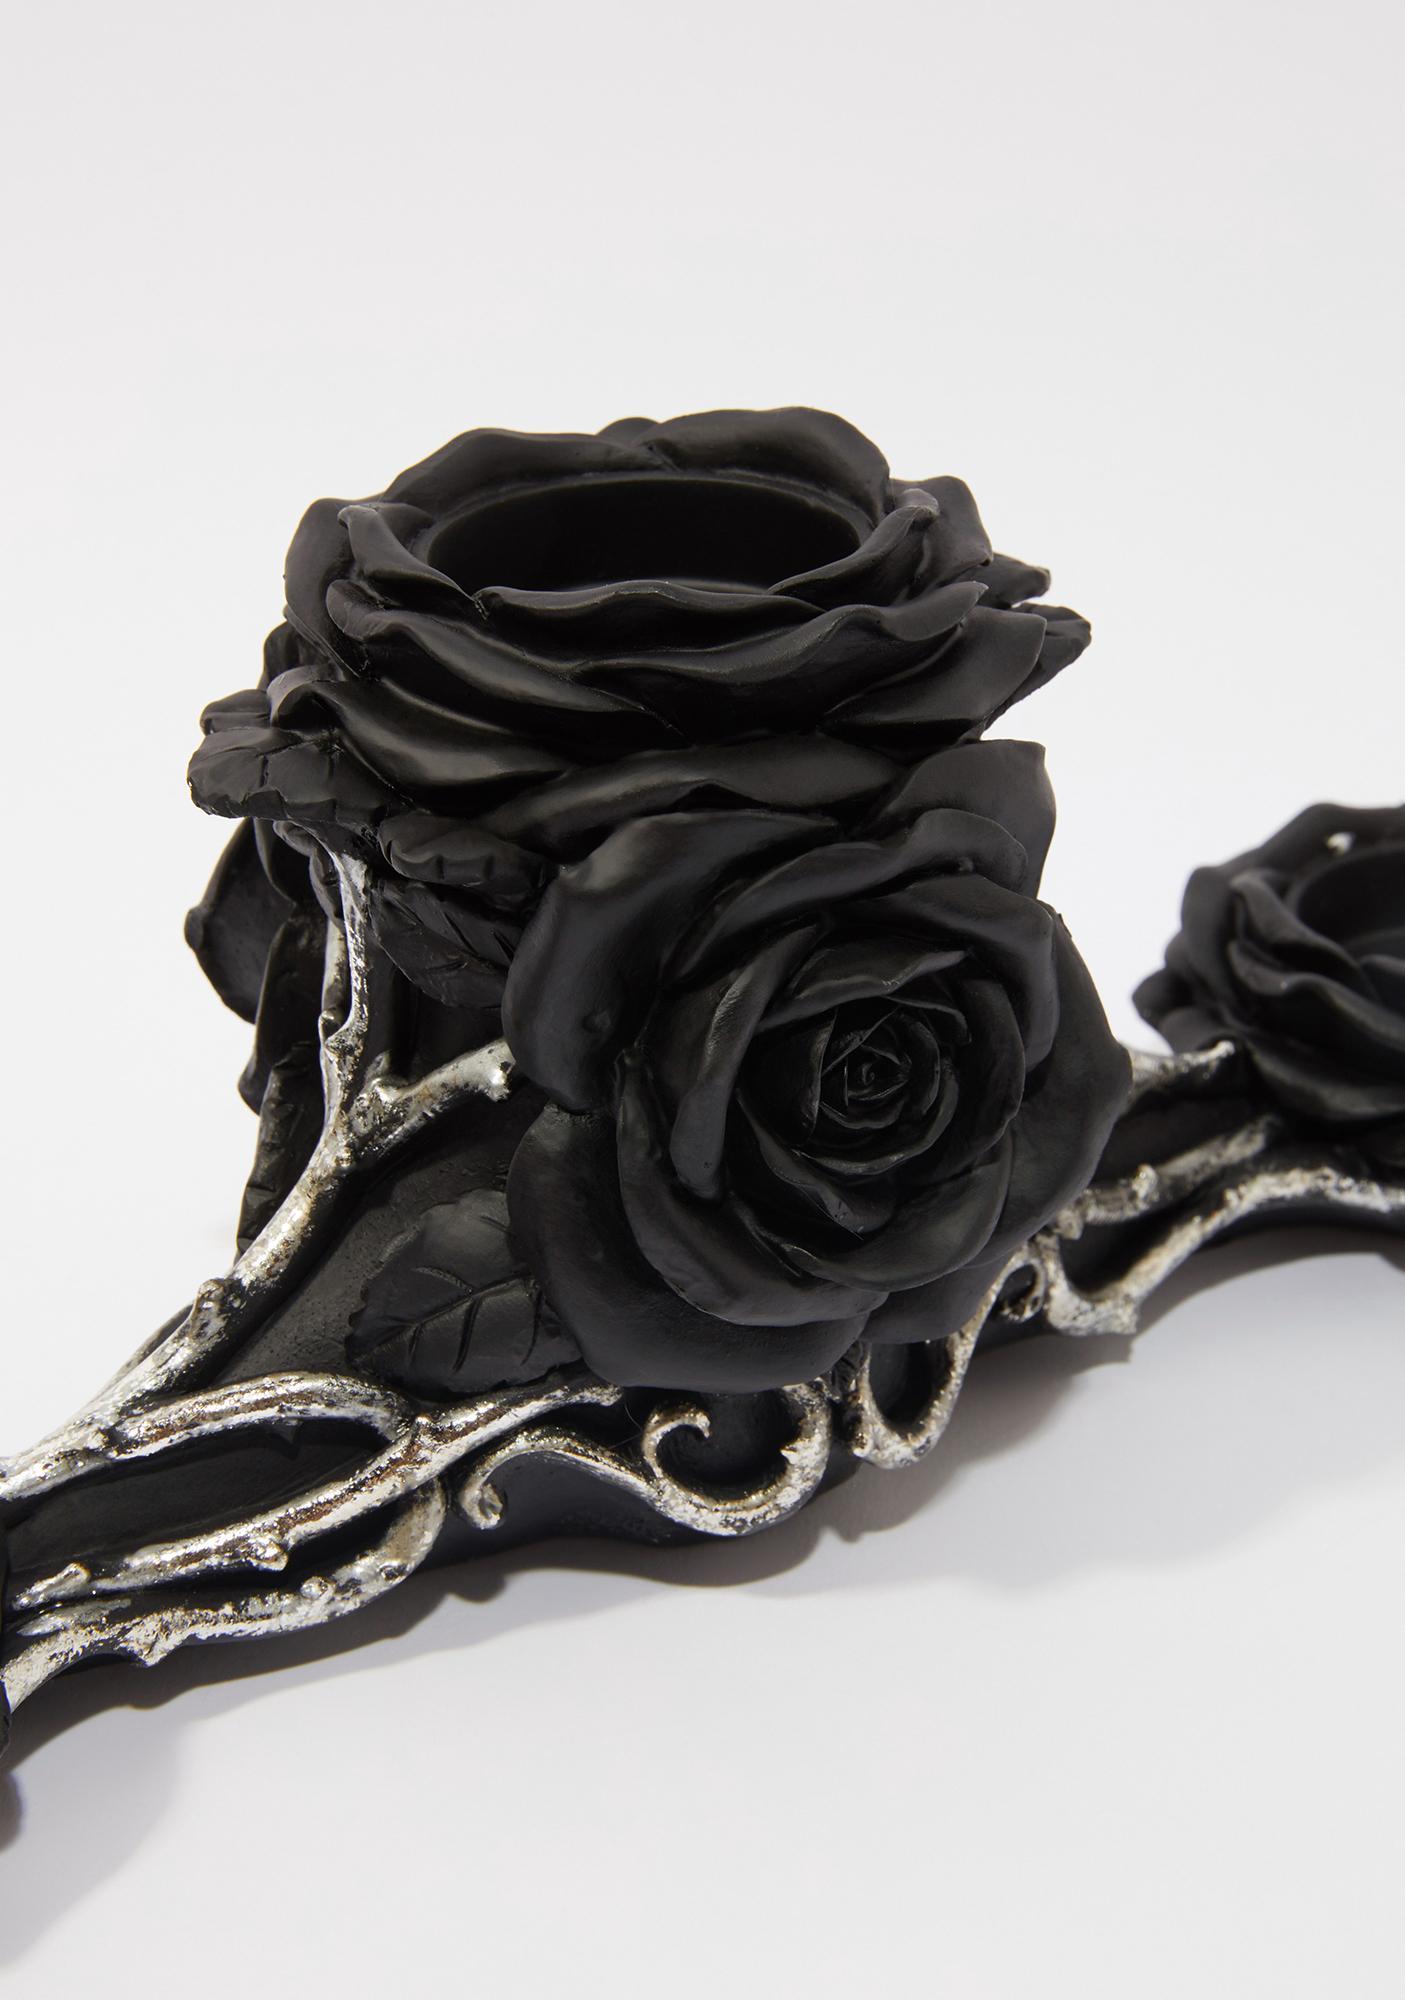 Alchemy England Black Rose Triple Tealight Holder